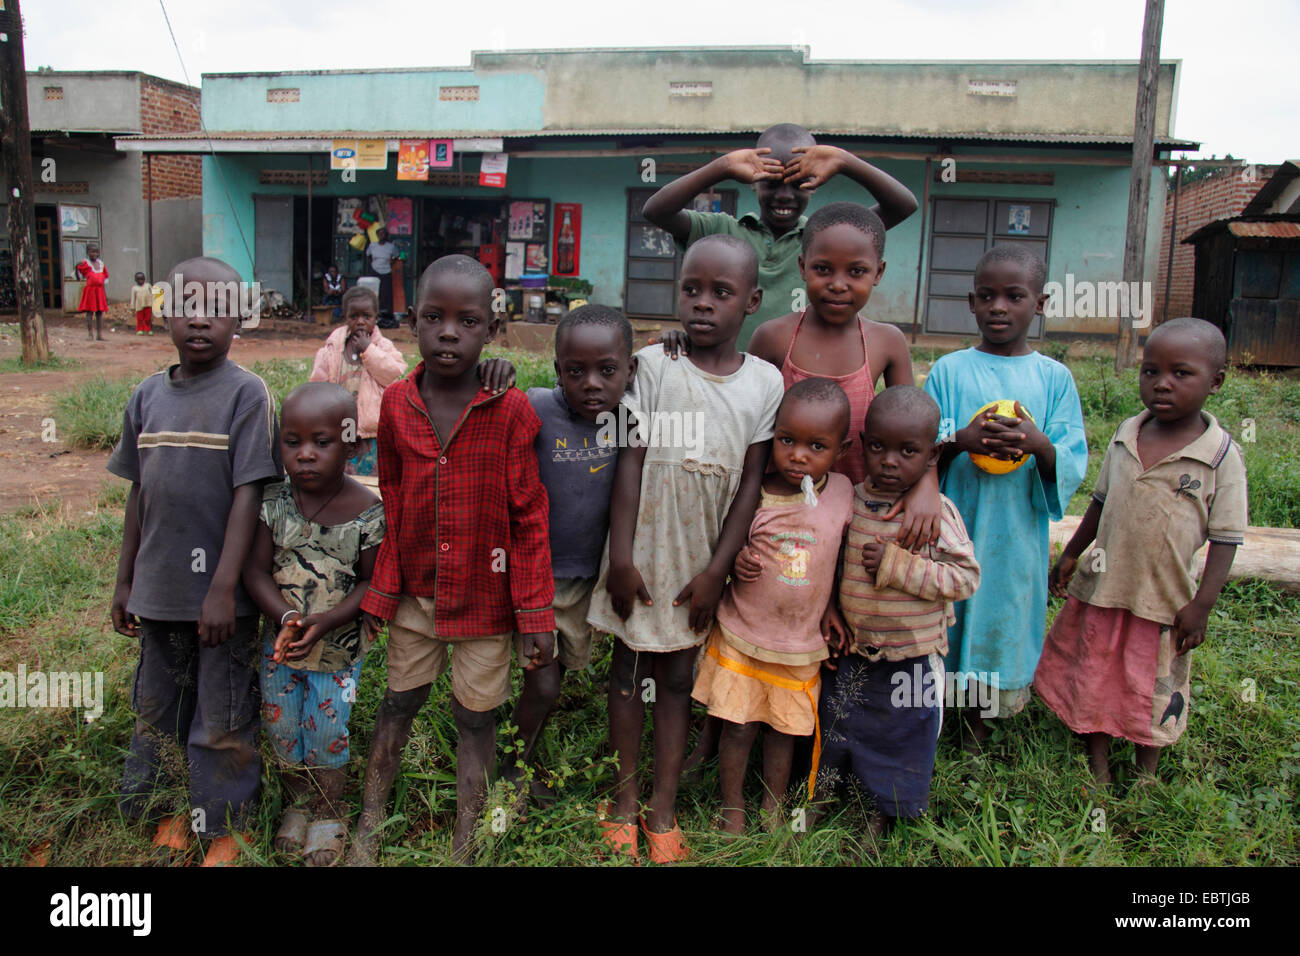 Grupo de niños africanos, Uganda Imagen De Stock